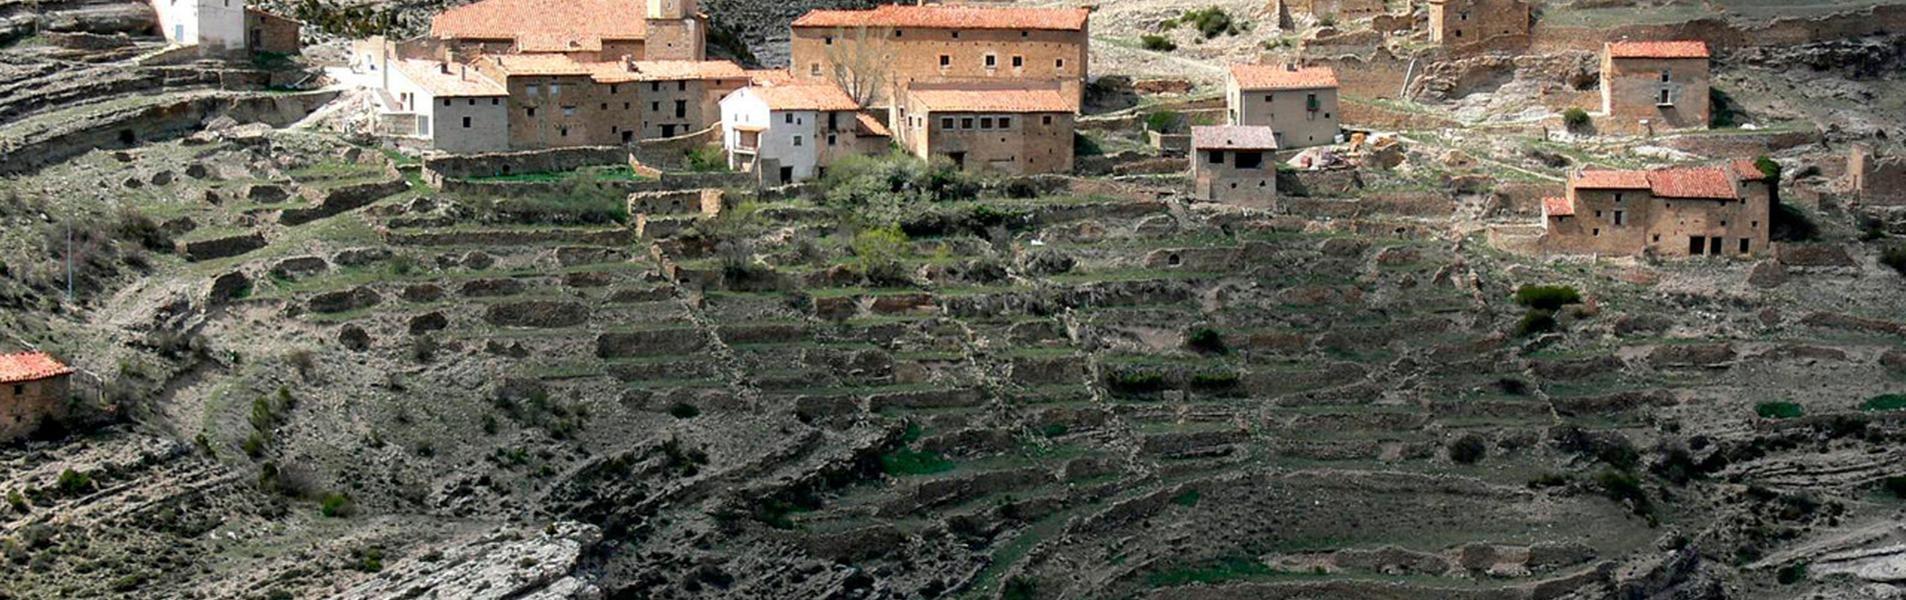 Cañada de Benatanduz